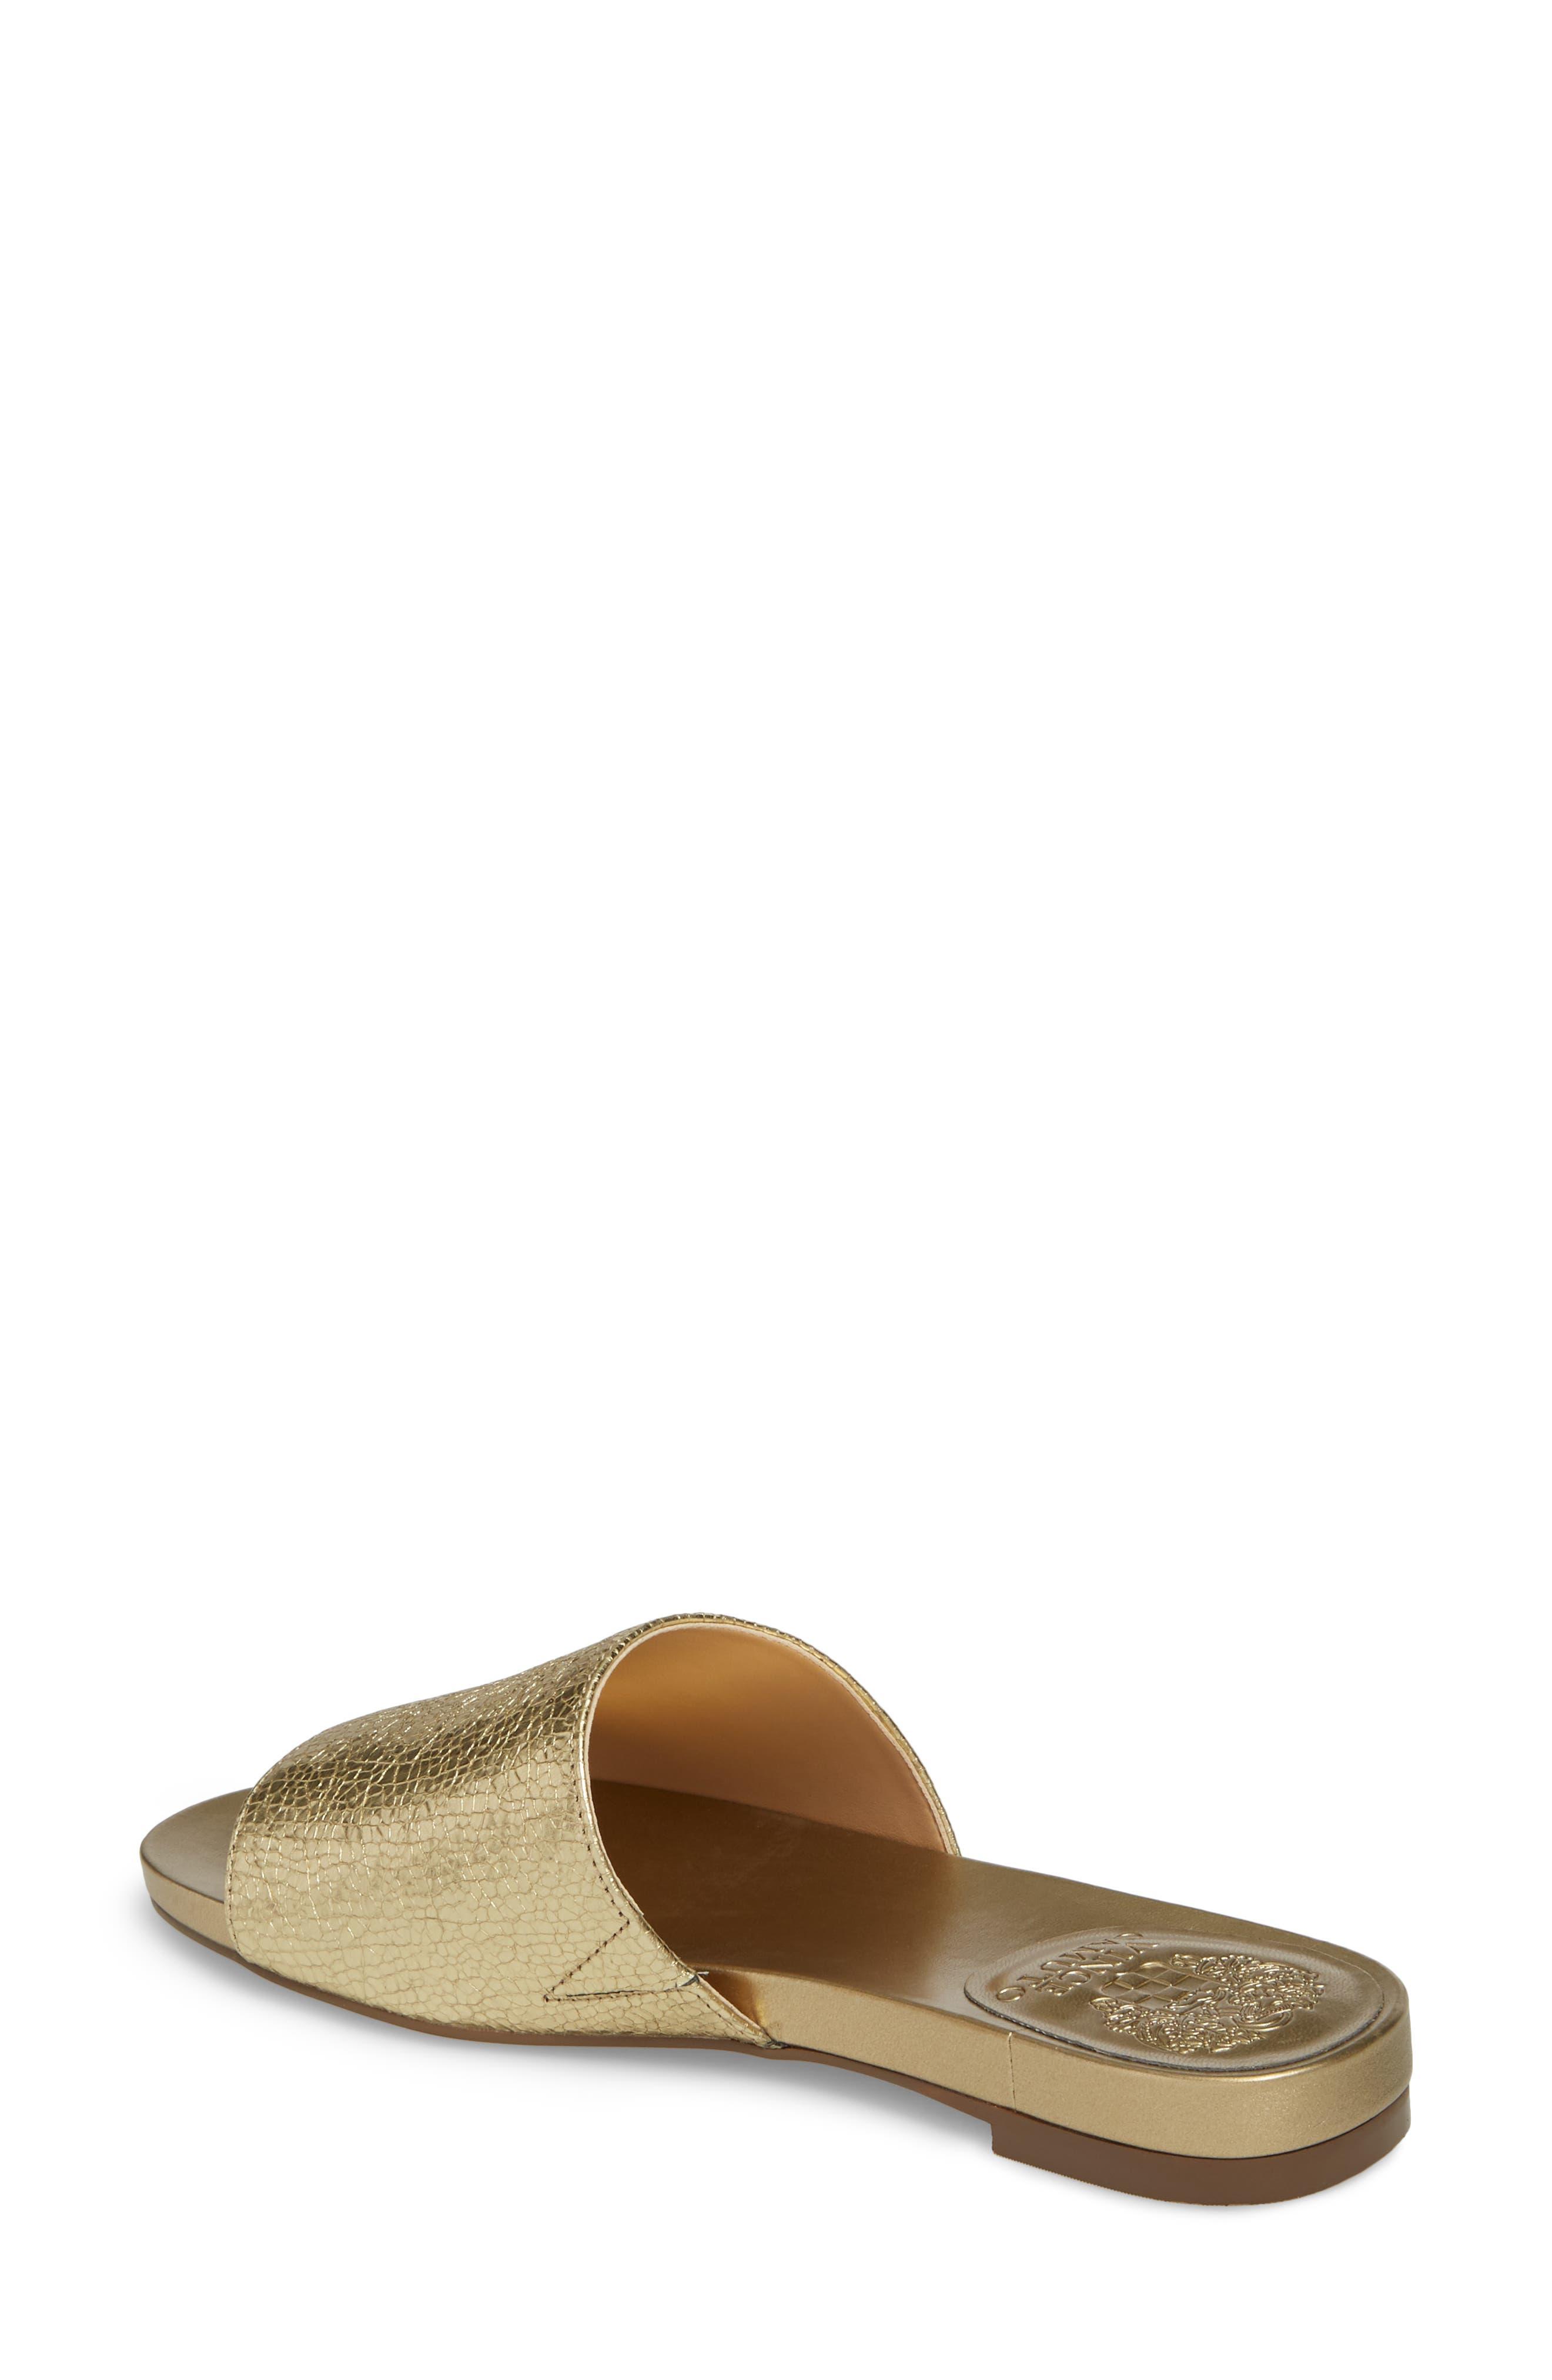 Haydan Slide Sandal,                             Alternate thumbnail 2, color,                             Karat Gold Fabric